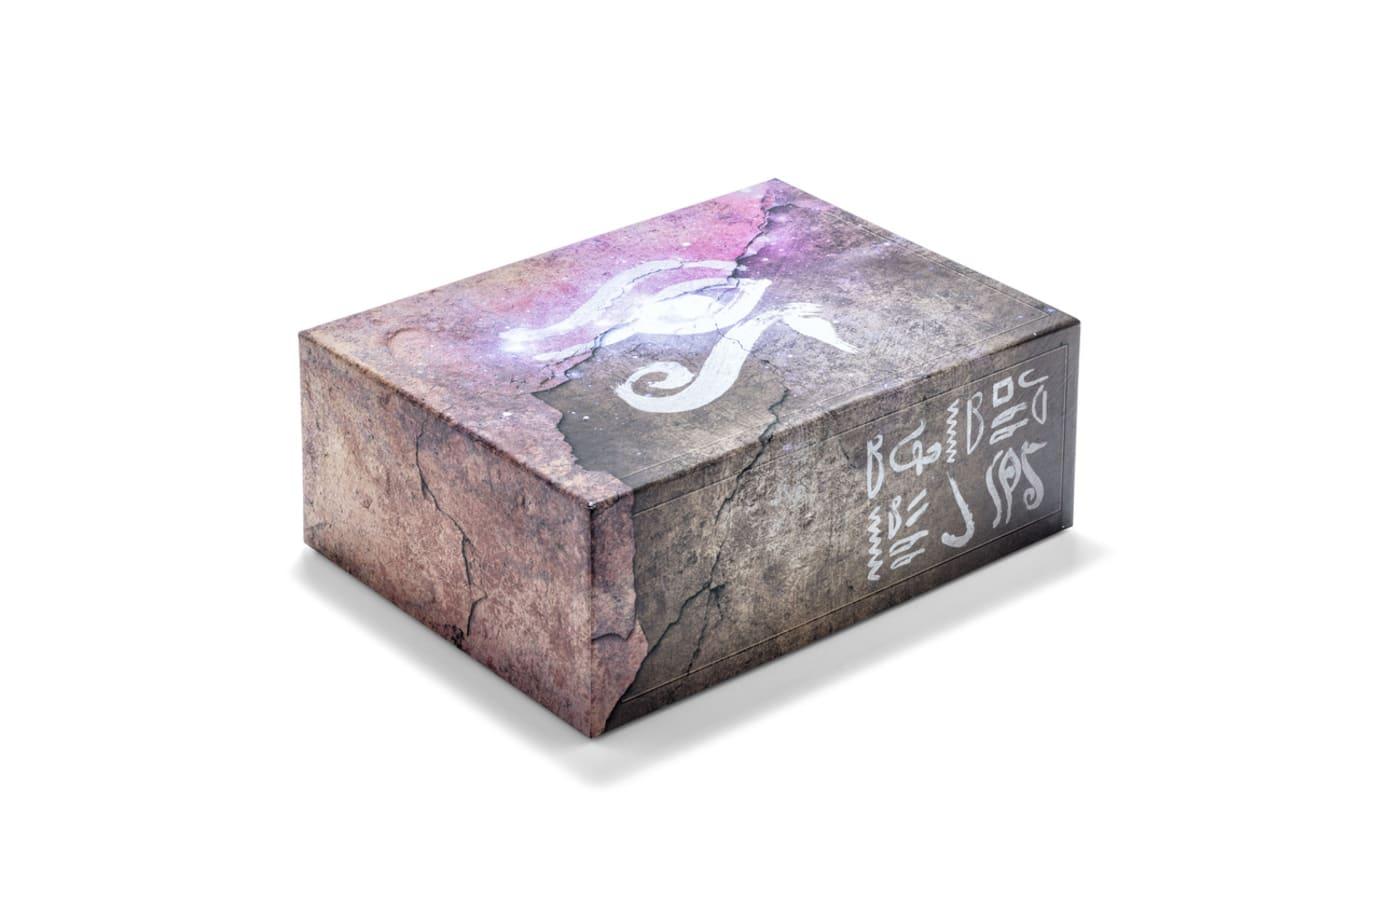 Concepts x Nike Kyrie 5 'Ikhet' Box 3